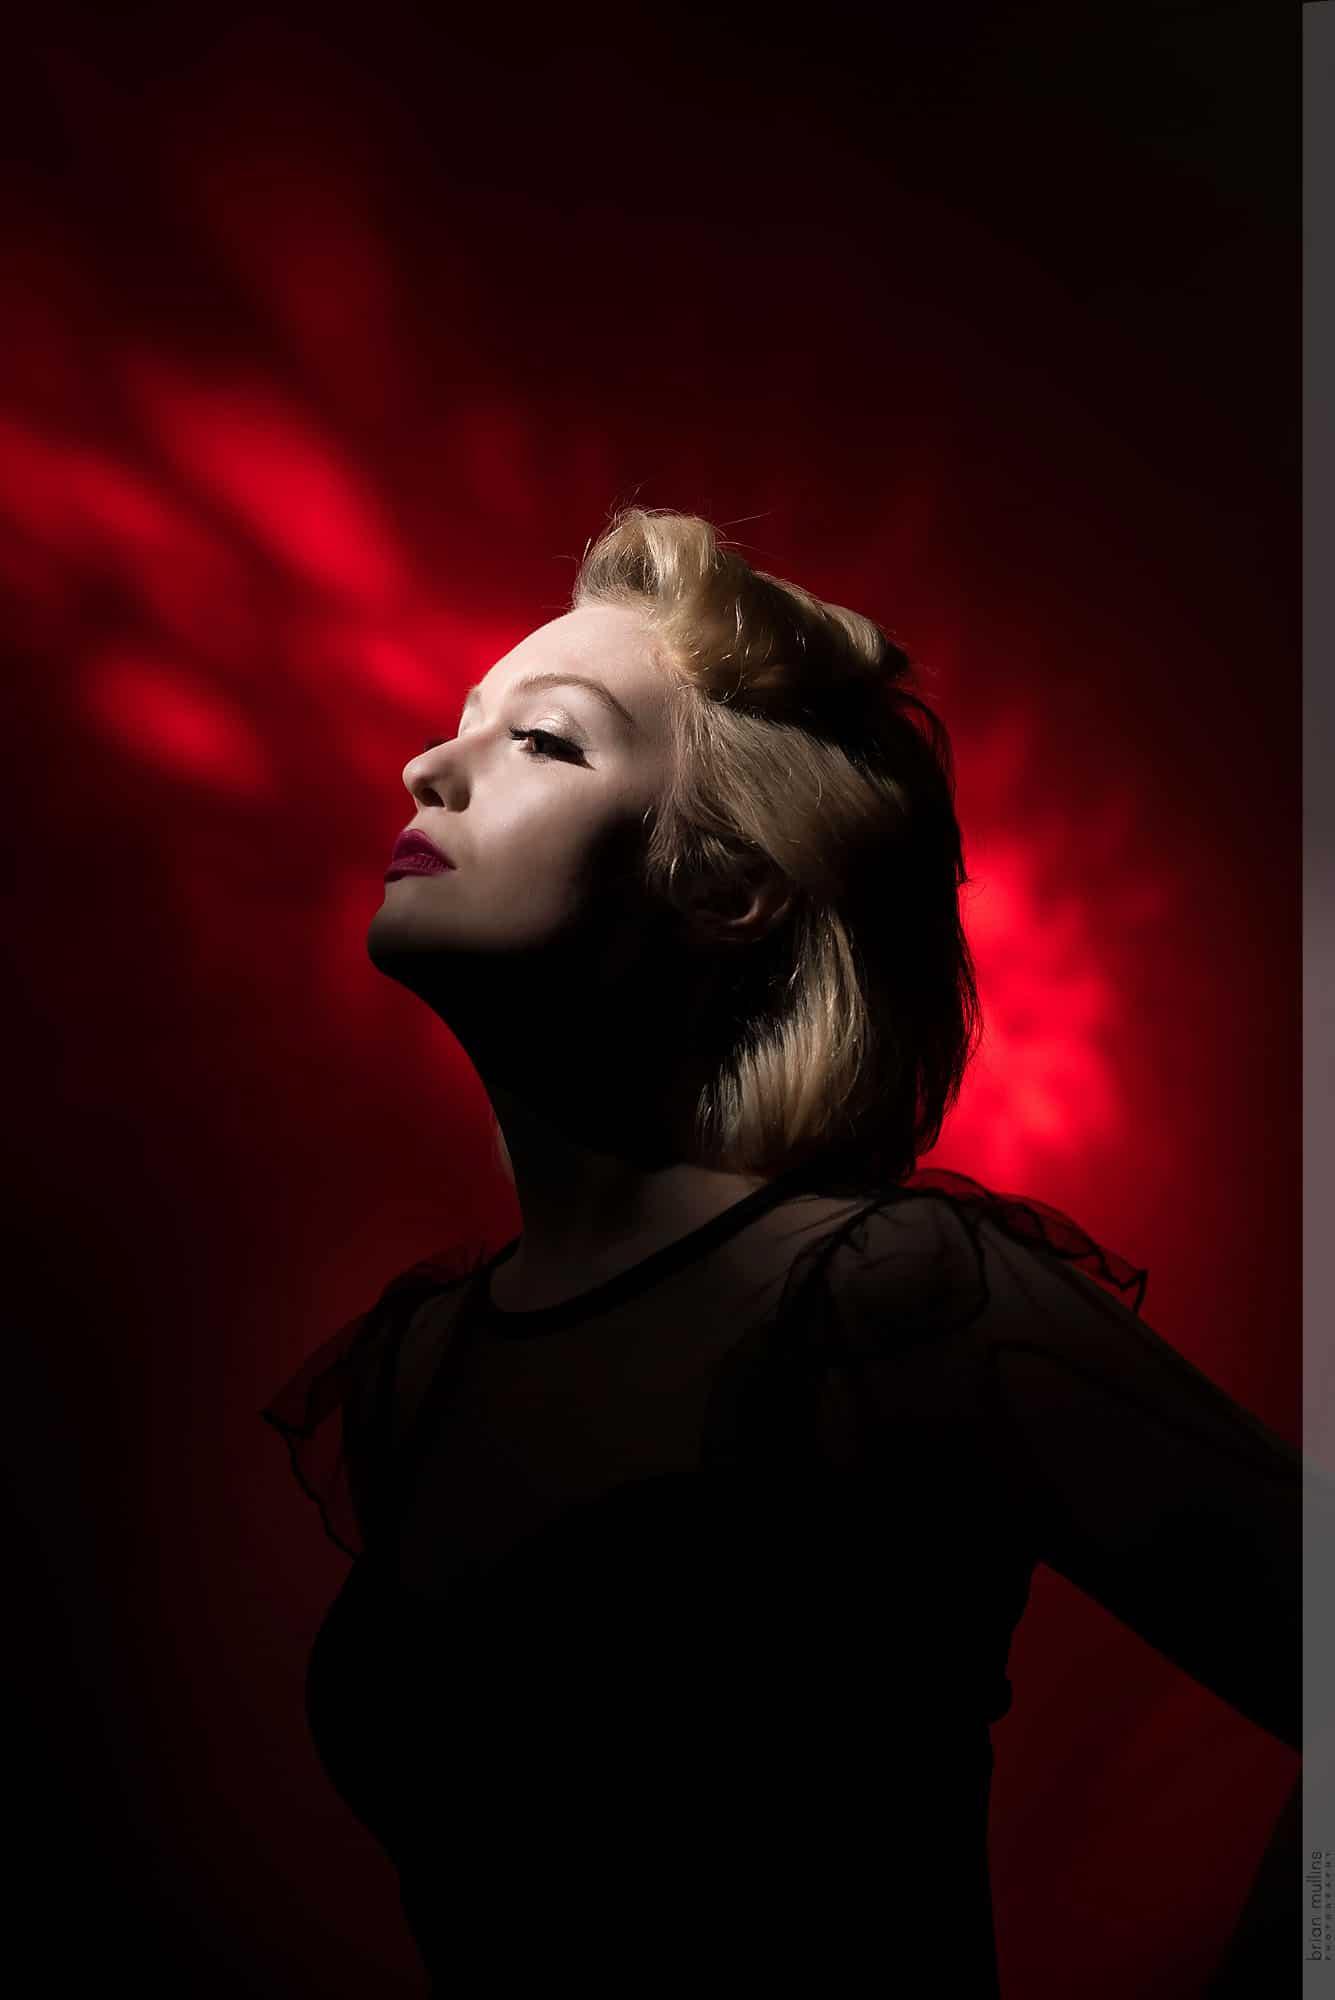 Photography Lighting class | the photos